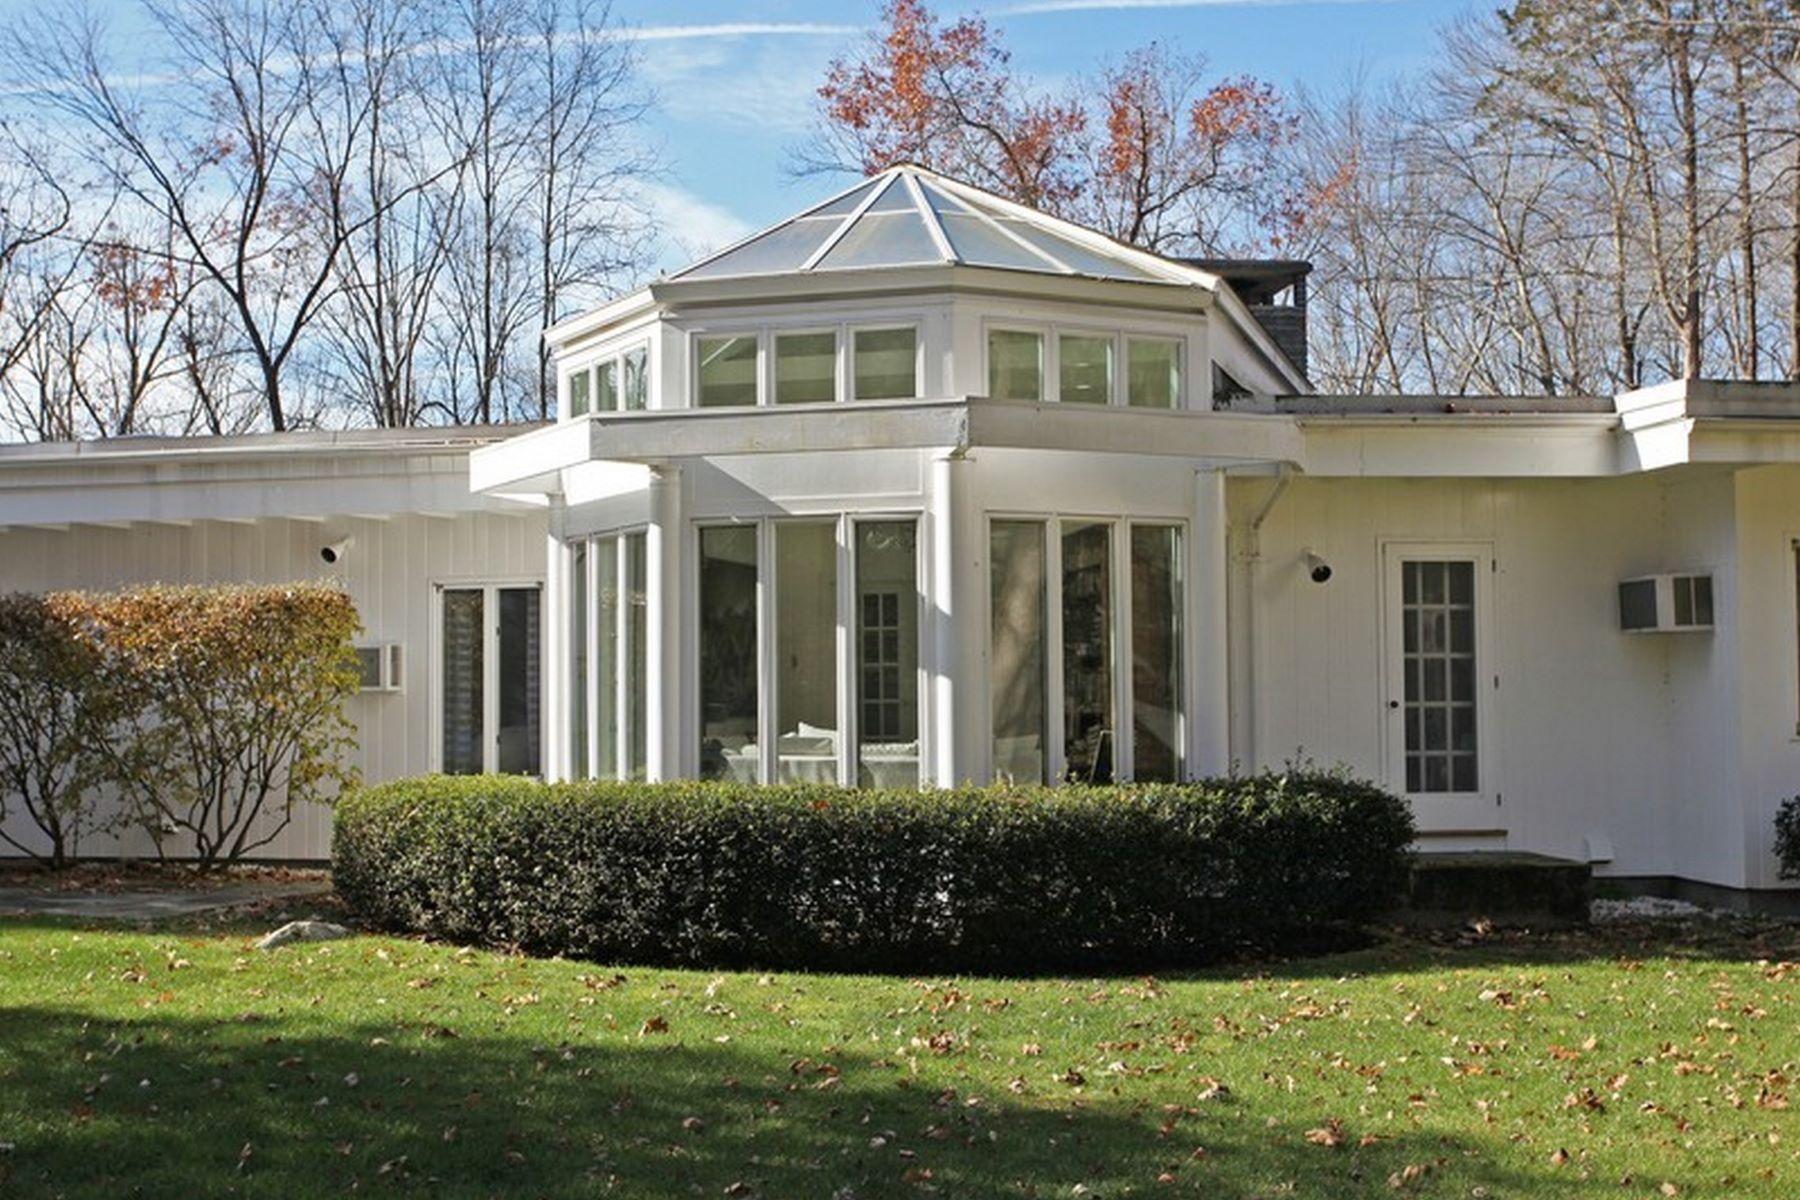 Additional photo for property listing at Sleek Mid-Century Modern 116 Wellers Bridge Road 罗克斯伯里, 康涅狄格州 06783 美国